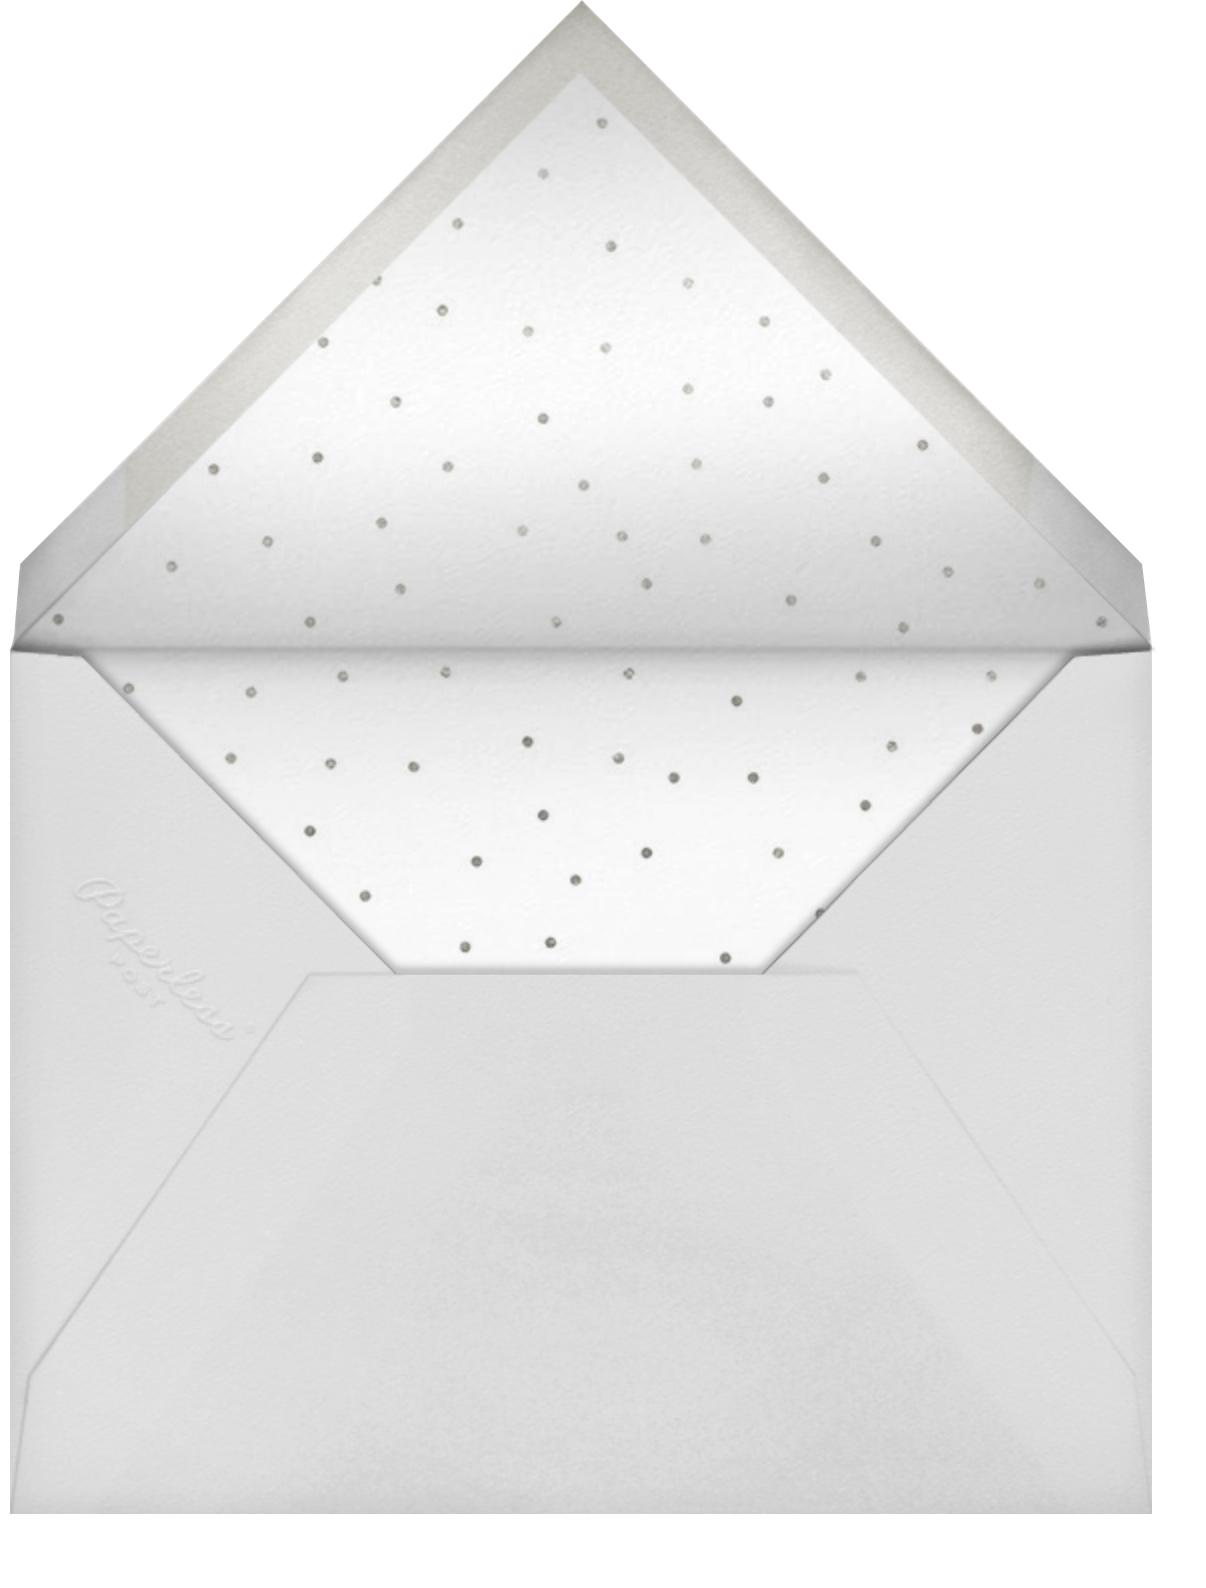 Lanterns - Blue - Paperless Post - Graduation party - envelope back